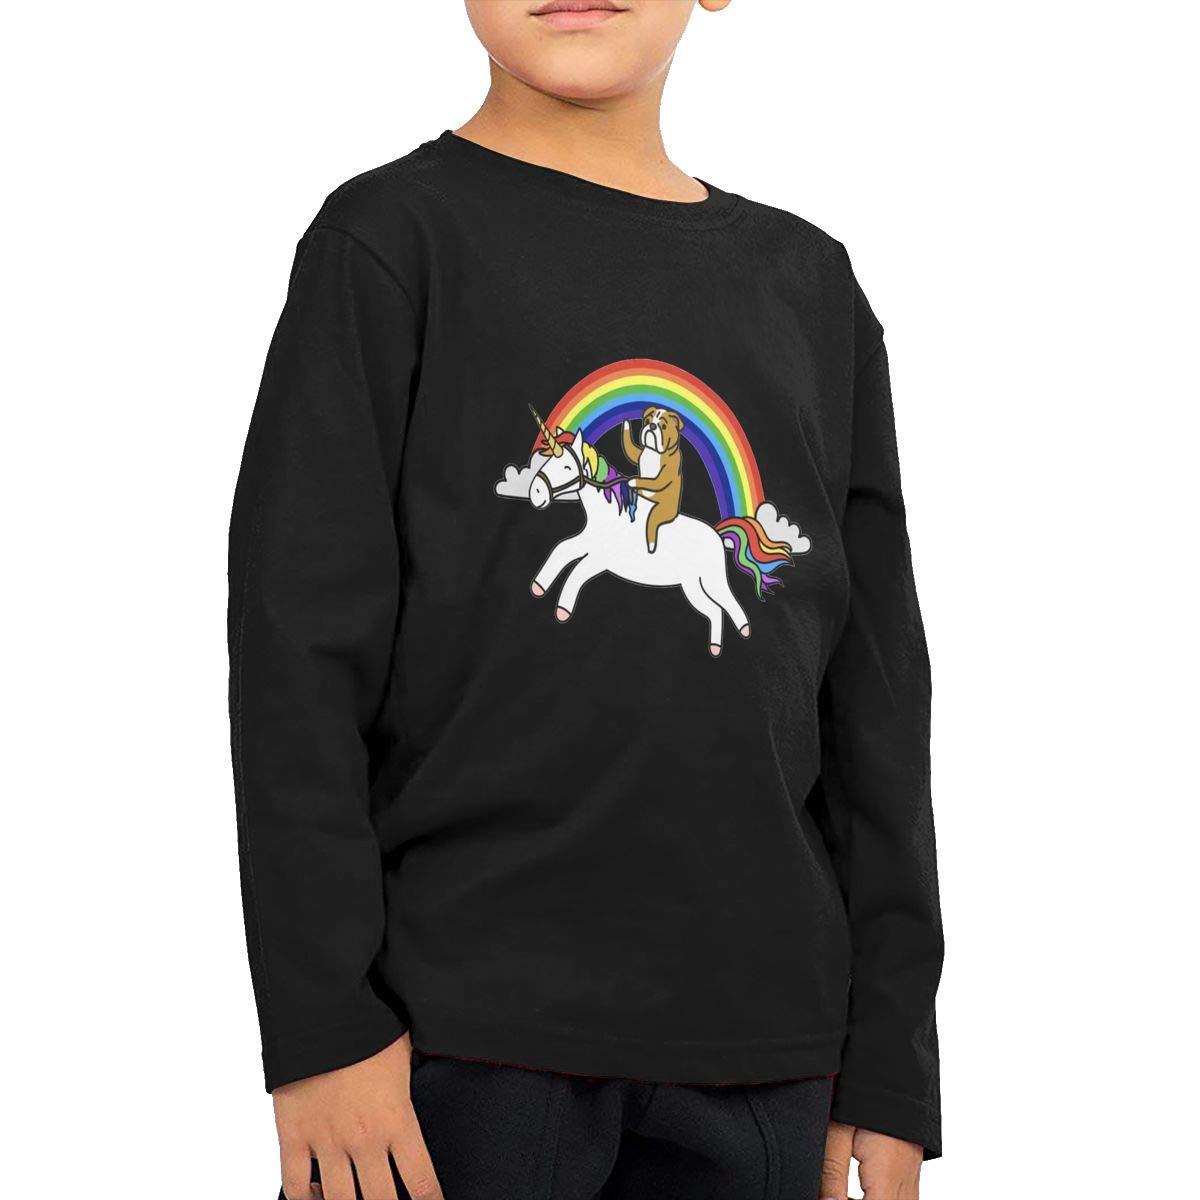 Bulldog Riding Unicorn Childrens Long Sleeve T-Shirt Boys Girls Cotton Tee Tops